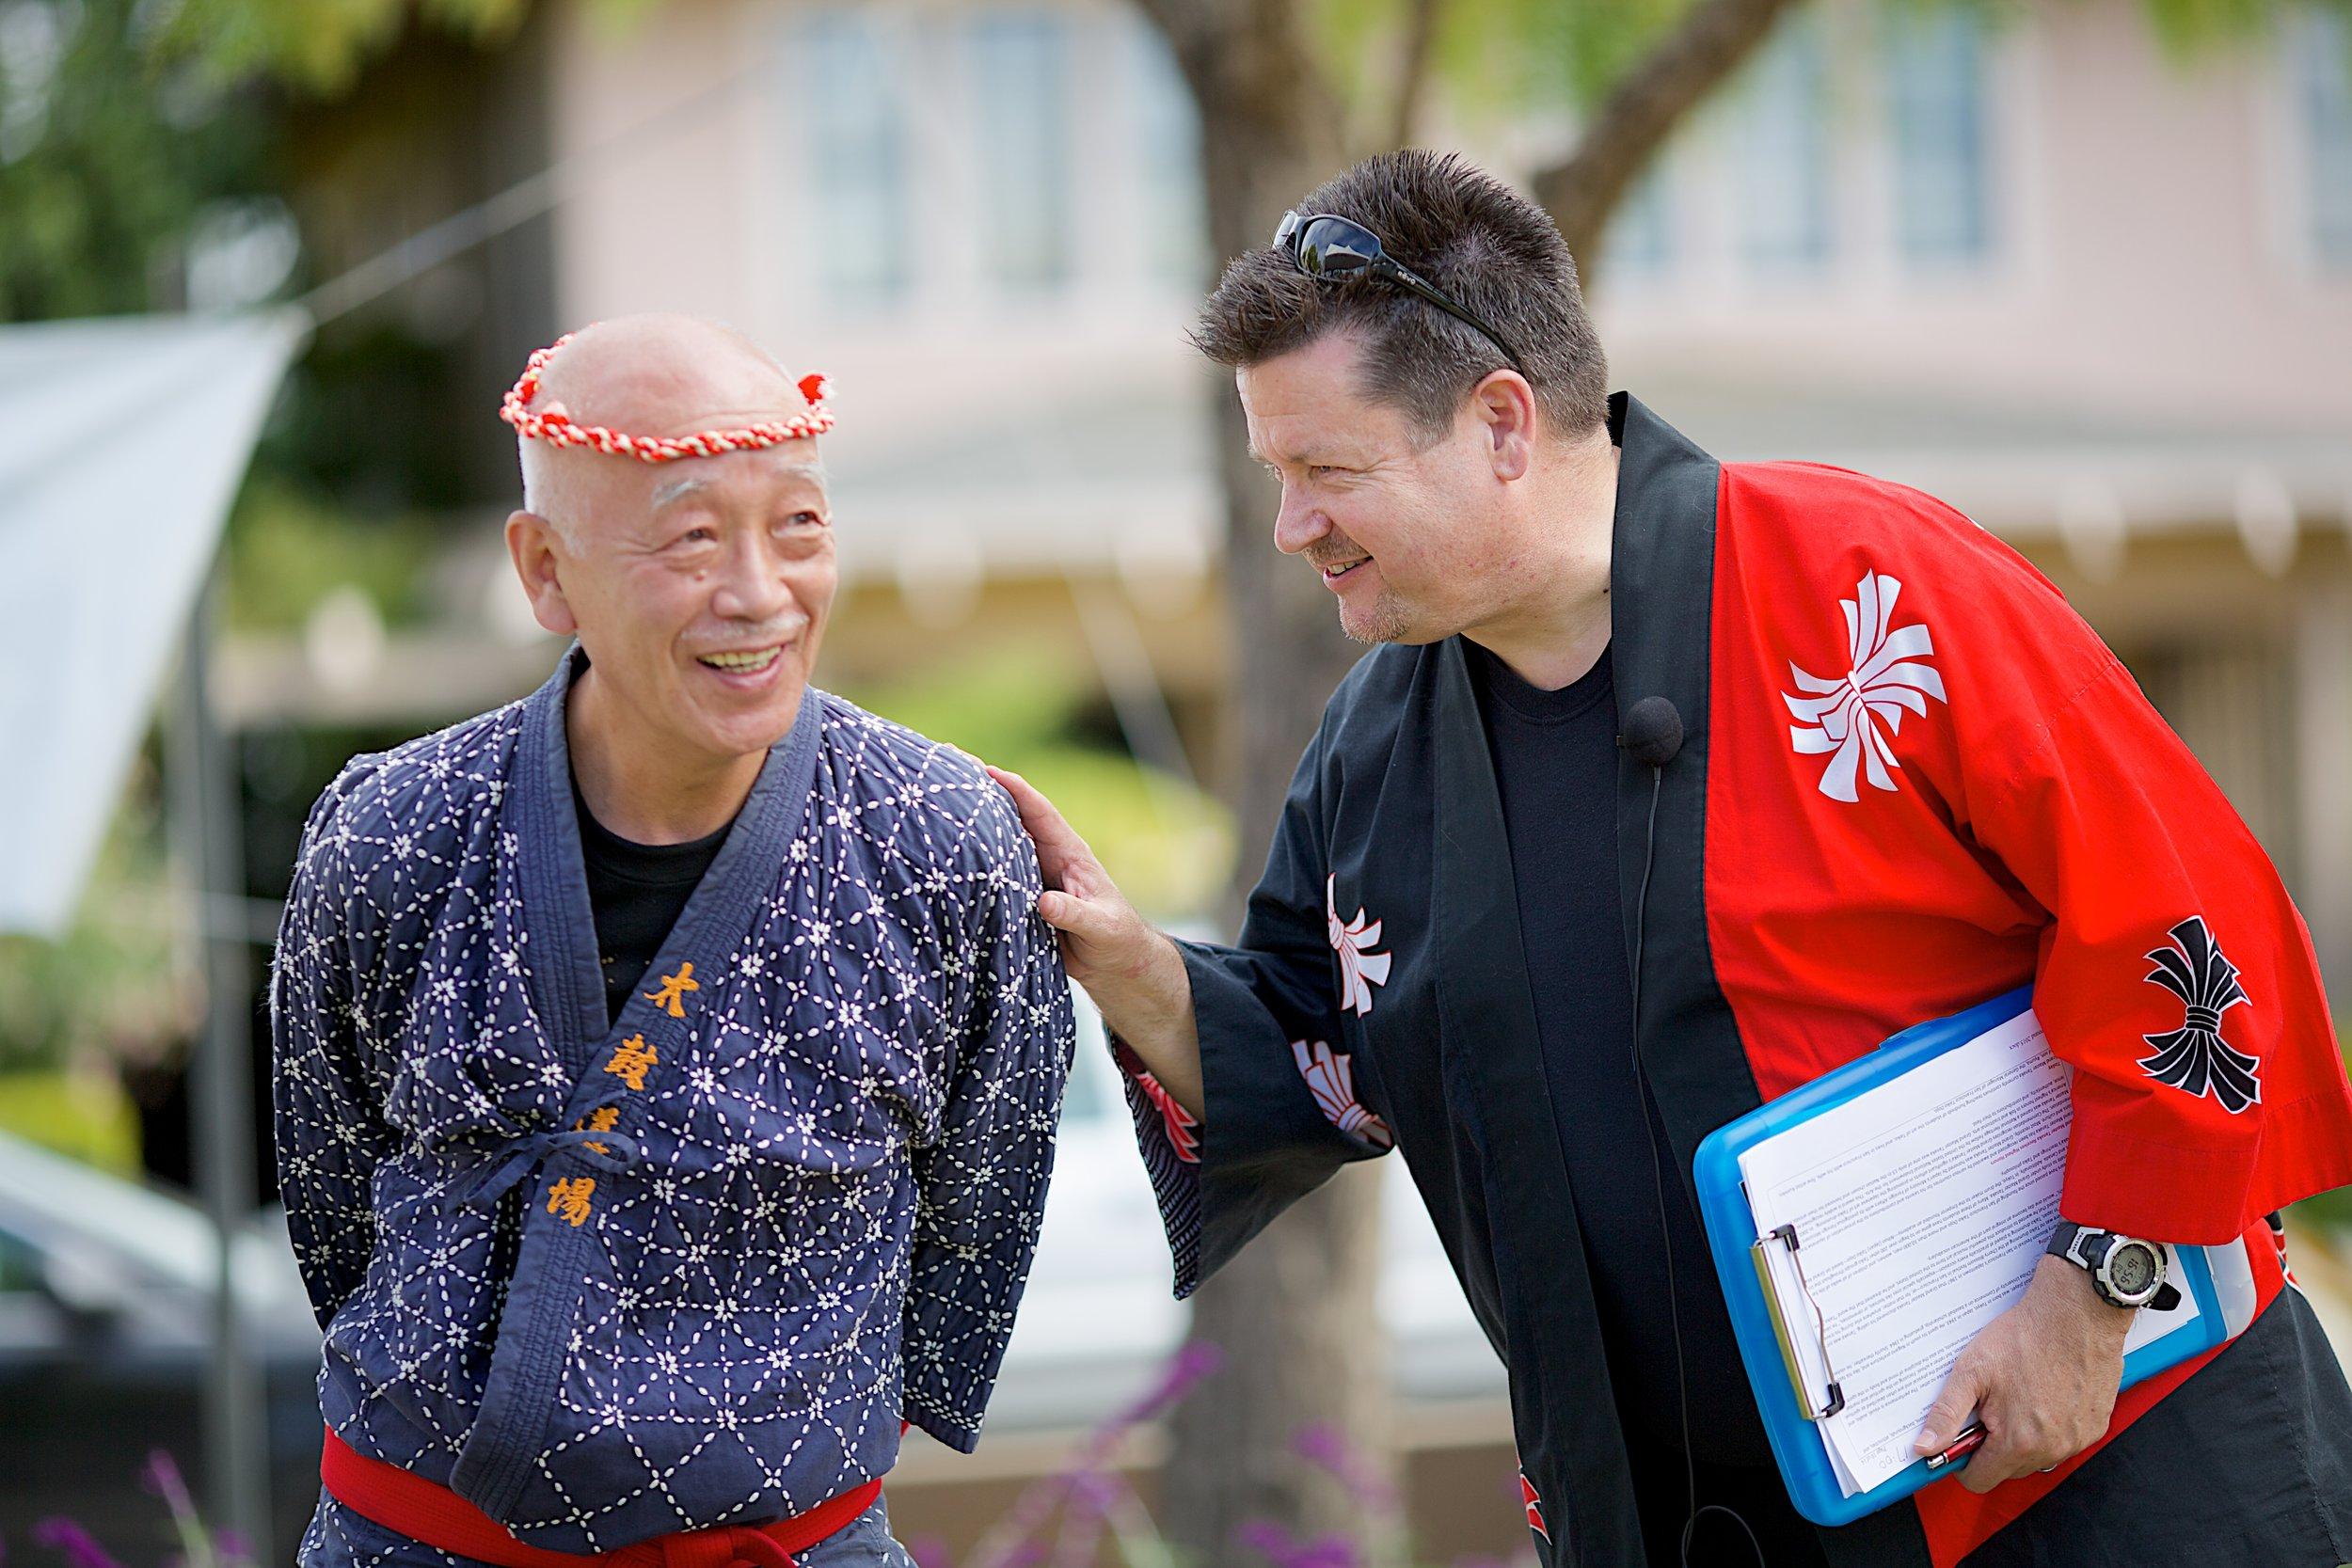 japanese-cultural-fair-of-santa-cruz-2015_19408606128_o.jpg